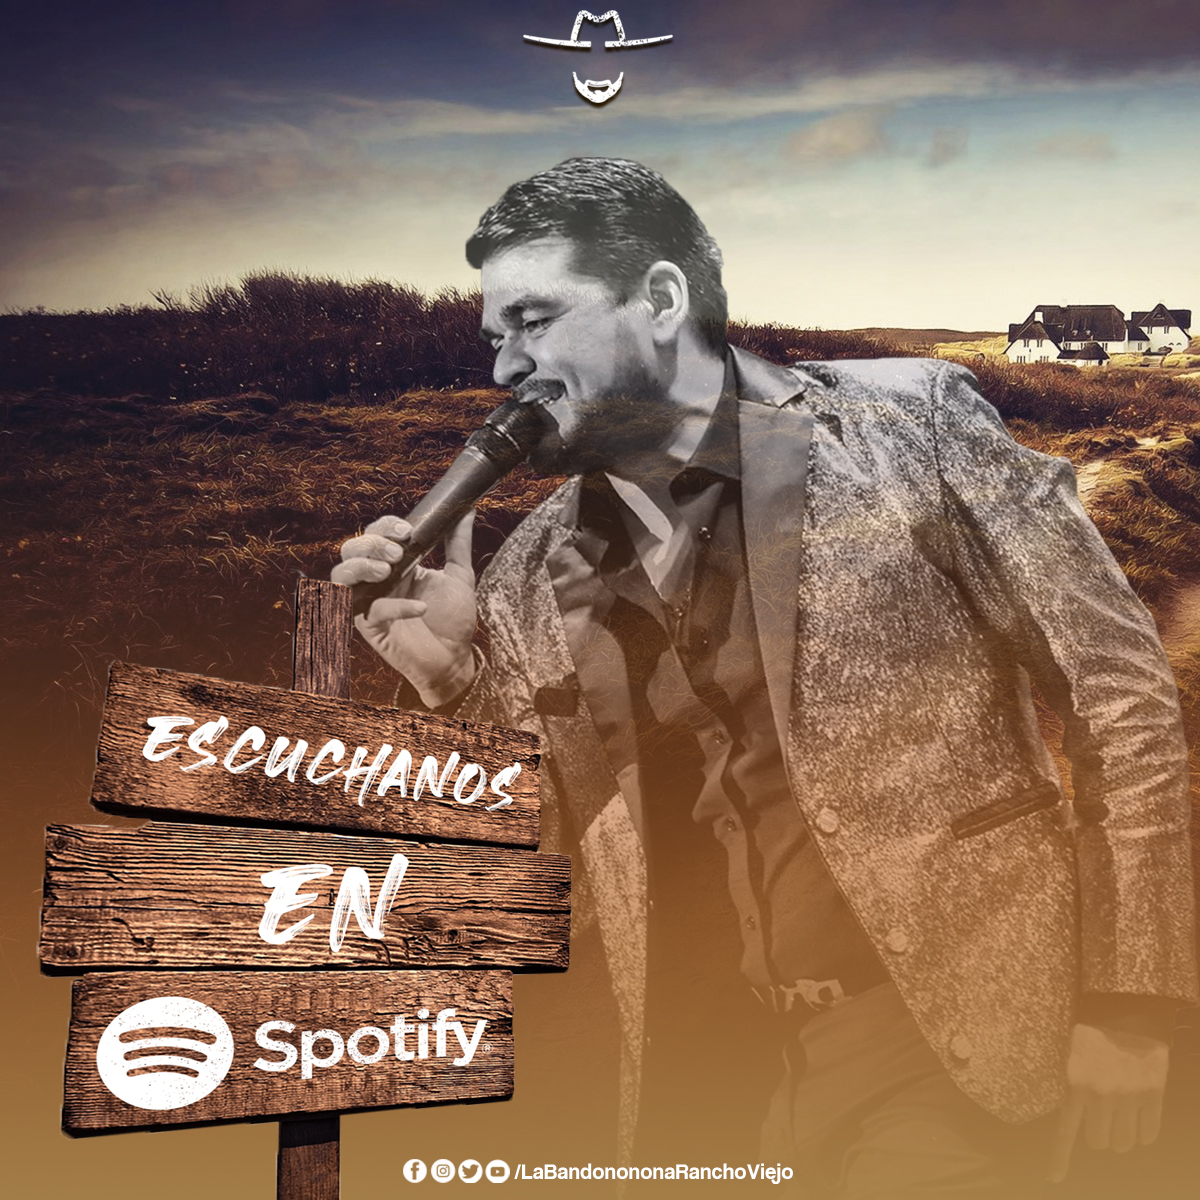 ¡Mi #GenteDeRancho !🤠 Escucha toda nuestra música #Spotify  🎧🎤 👉 https://t.co/ePXFKE5wWF https://t.co/TiVF9MZnAu